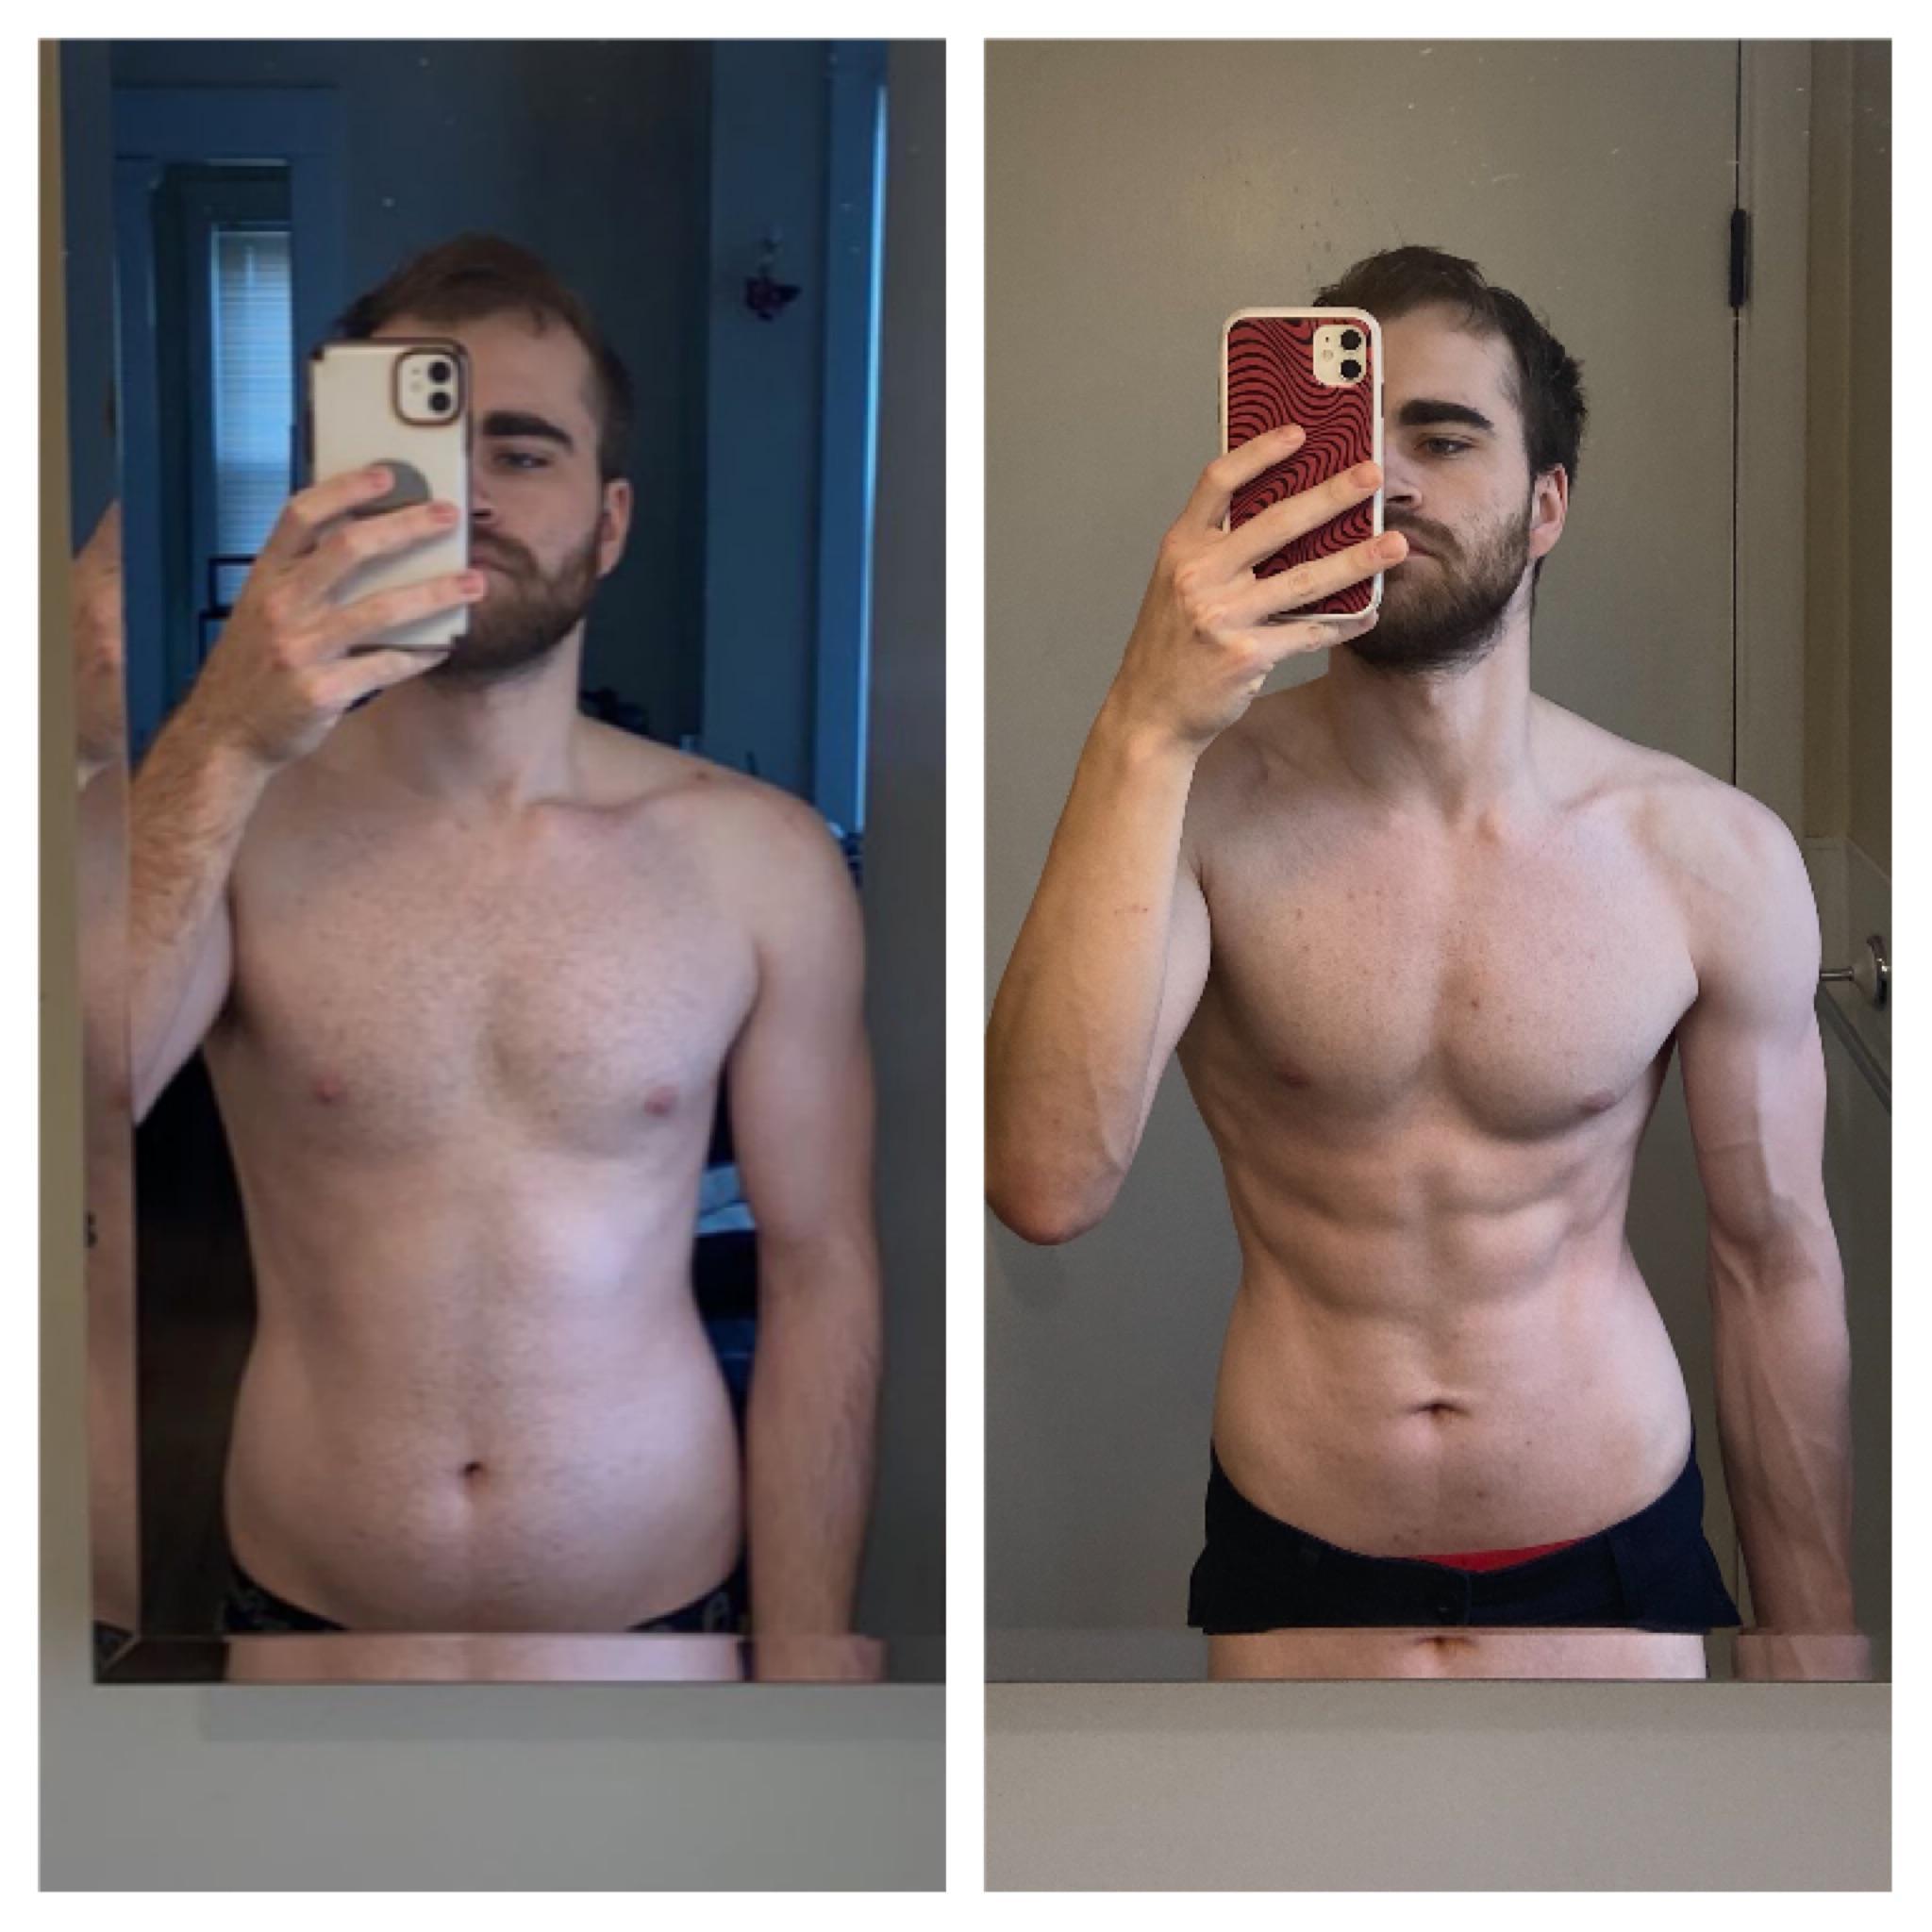 Progress Pics of 10 lbs Weight Loss 5 feet 8 Male 159 lbs to 149 lbs